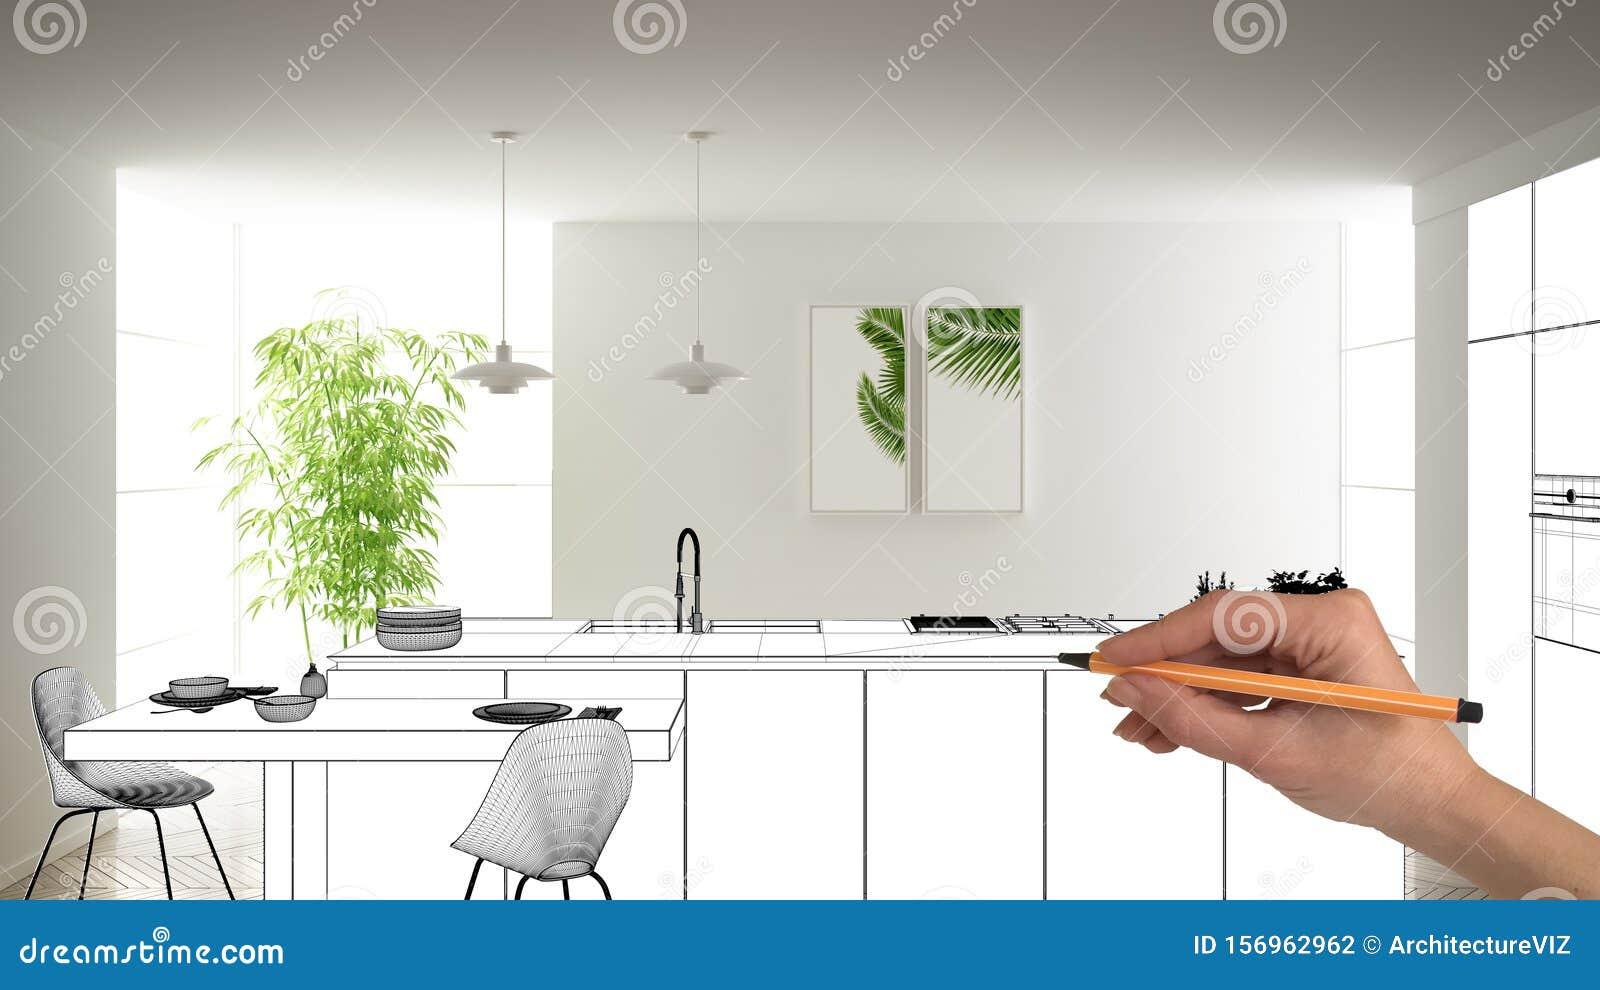 Unfinished Project Under Construction Draft Concept Interior Design Sketch Hand Drawing Blueprint Kitchen Sketch In Real Stock Illustration Illustration Of Indoors Development 156962962